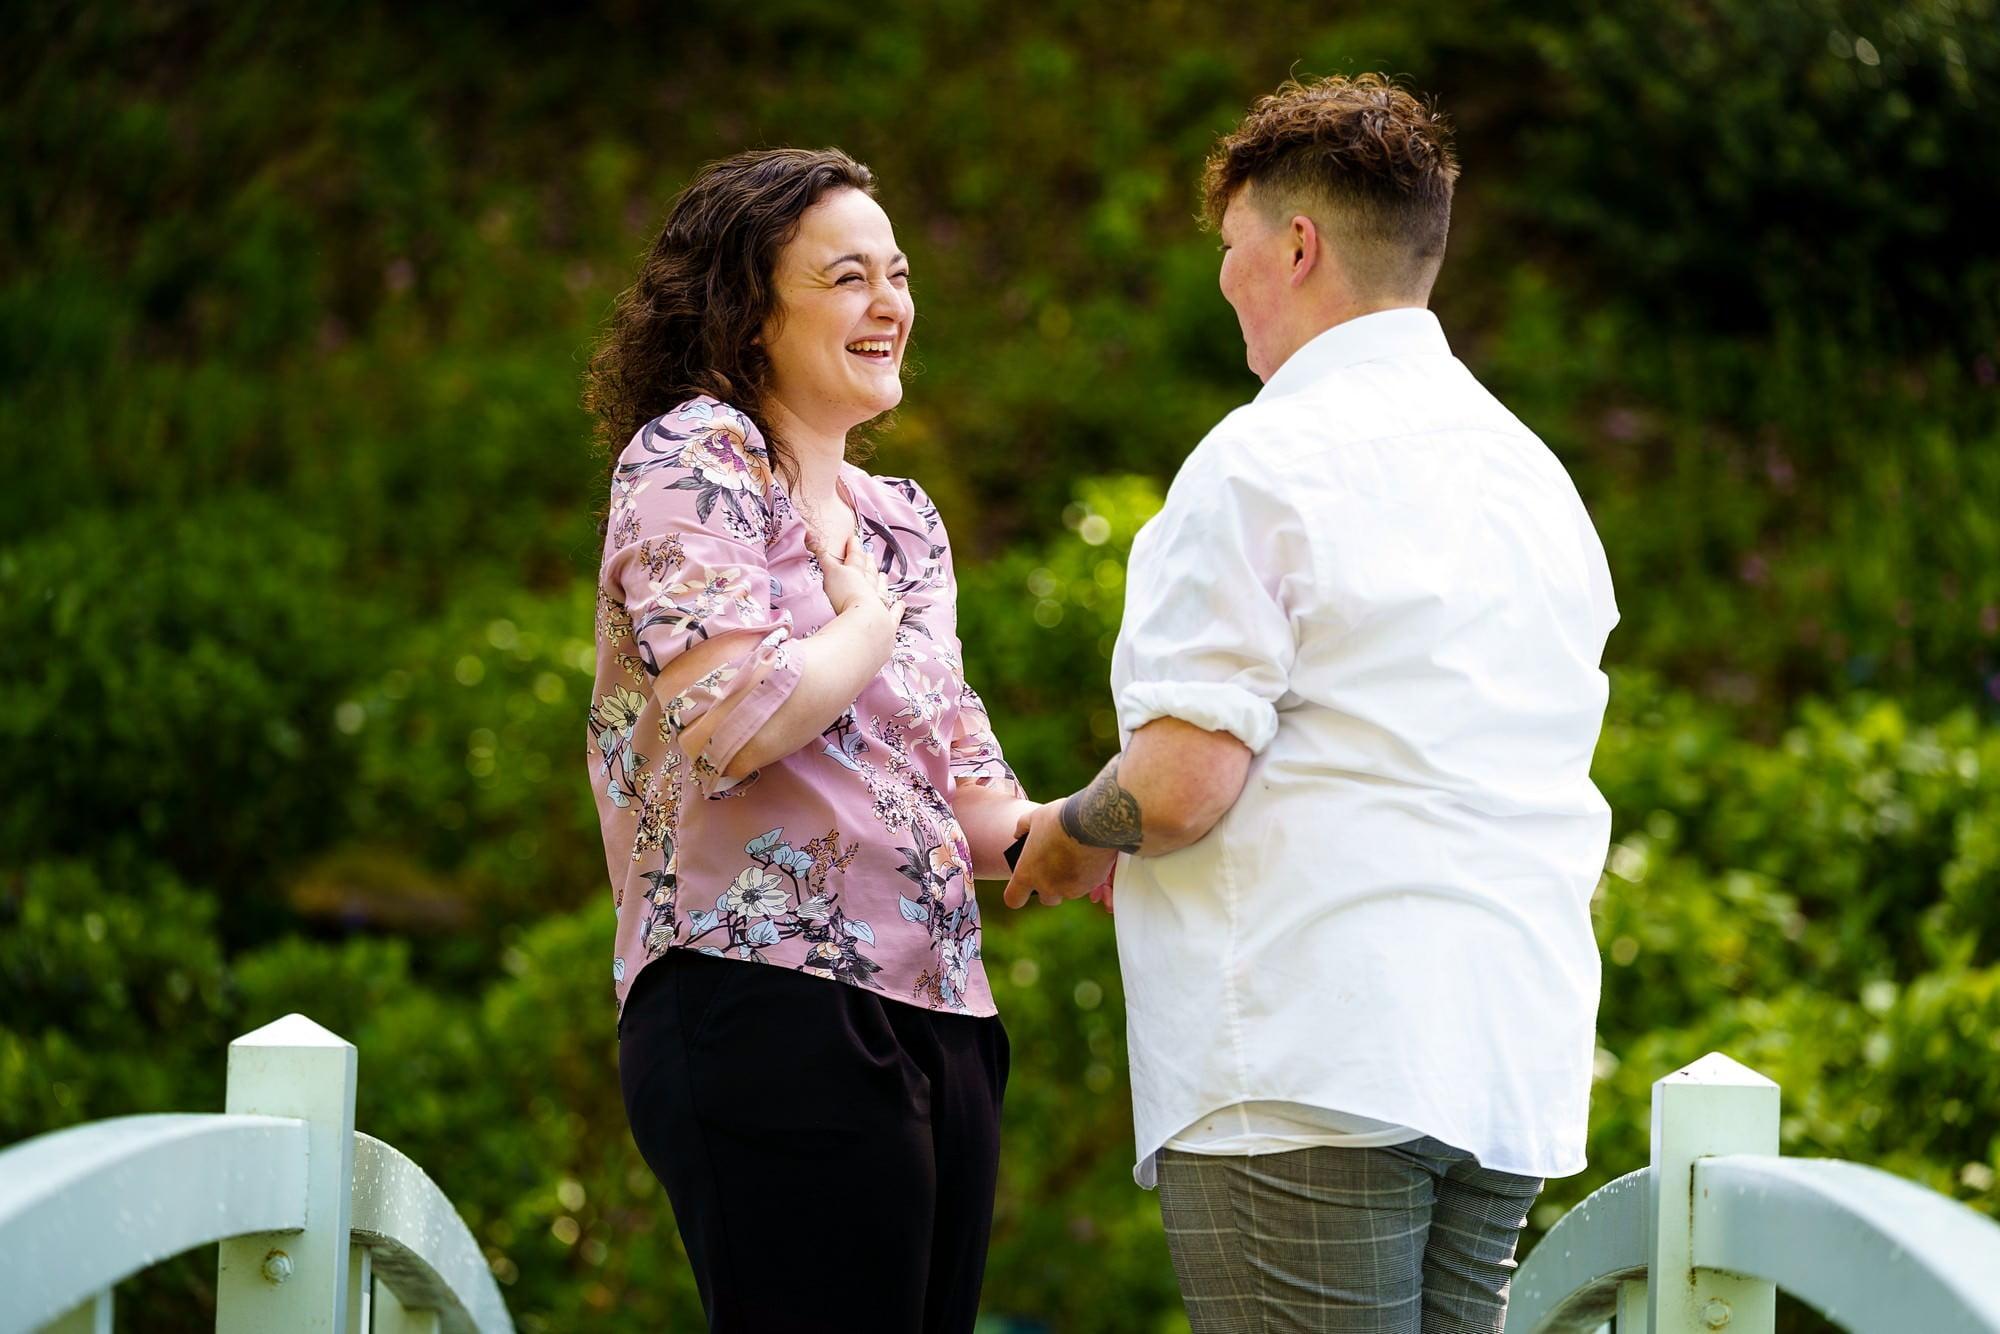 gay wedding proposal in cornwall